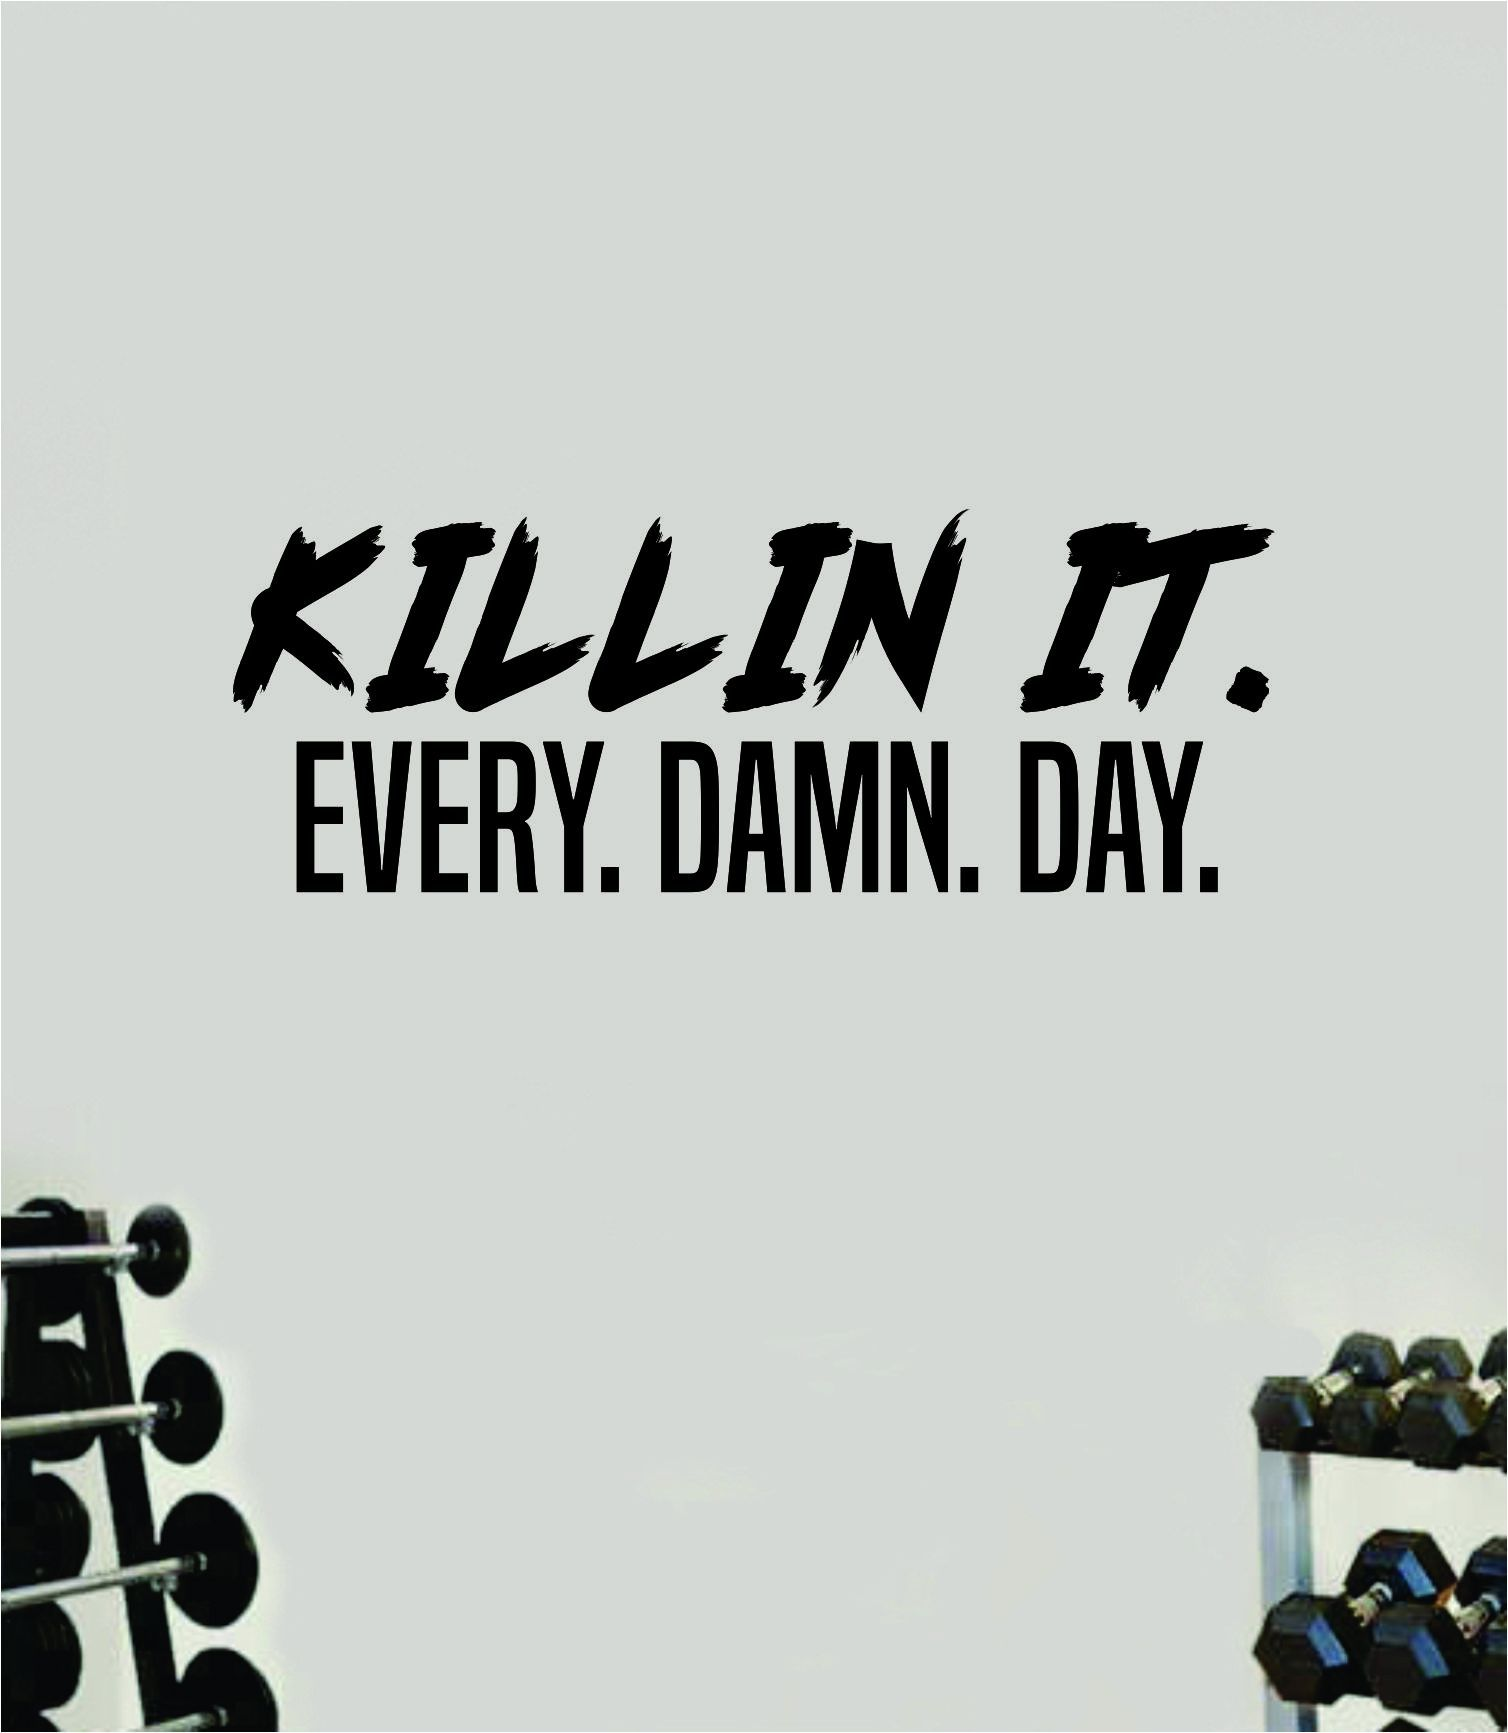 Killin It Every Damn Day Quote Wall Decal Sticker Vinyl Art Wall Bedroom Room Home Decor Inspirational Motivational Sports Lift Gym Fitness Girls Train Beast - black